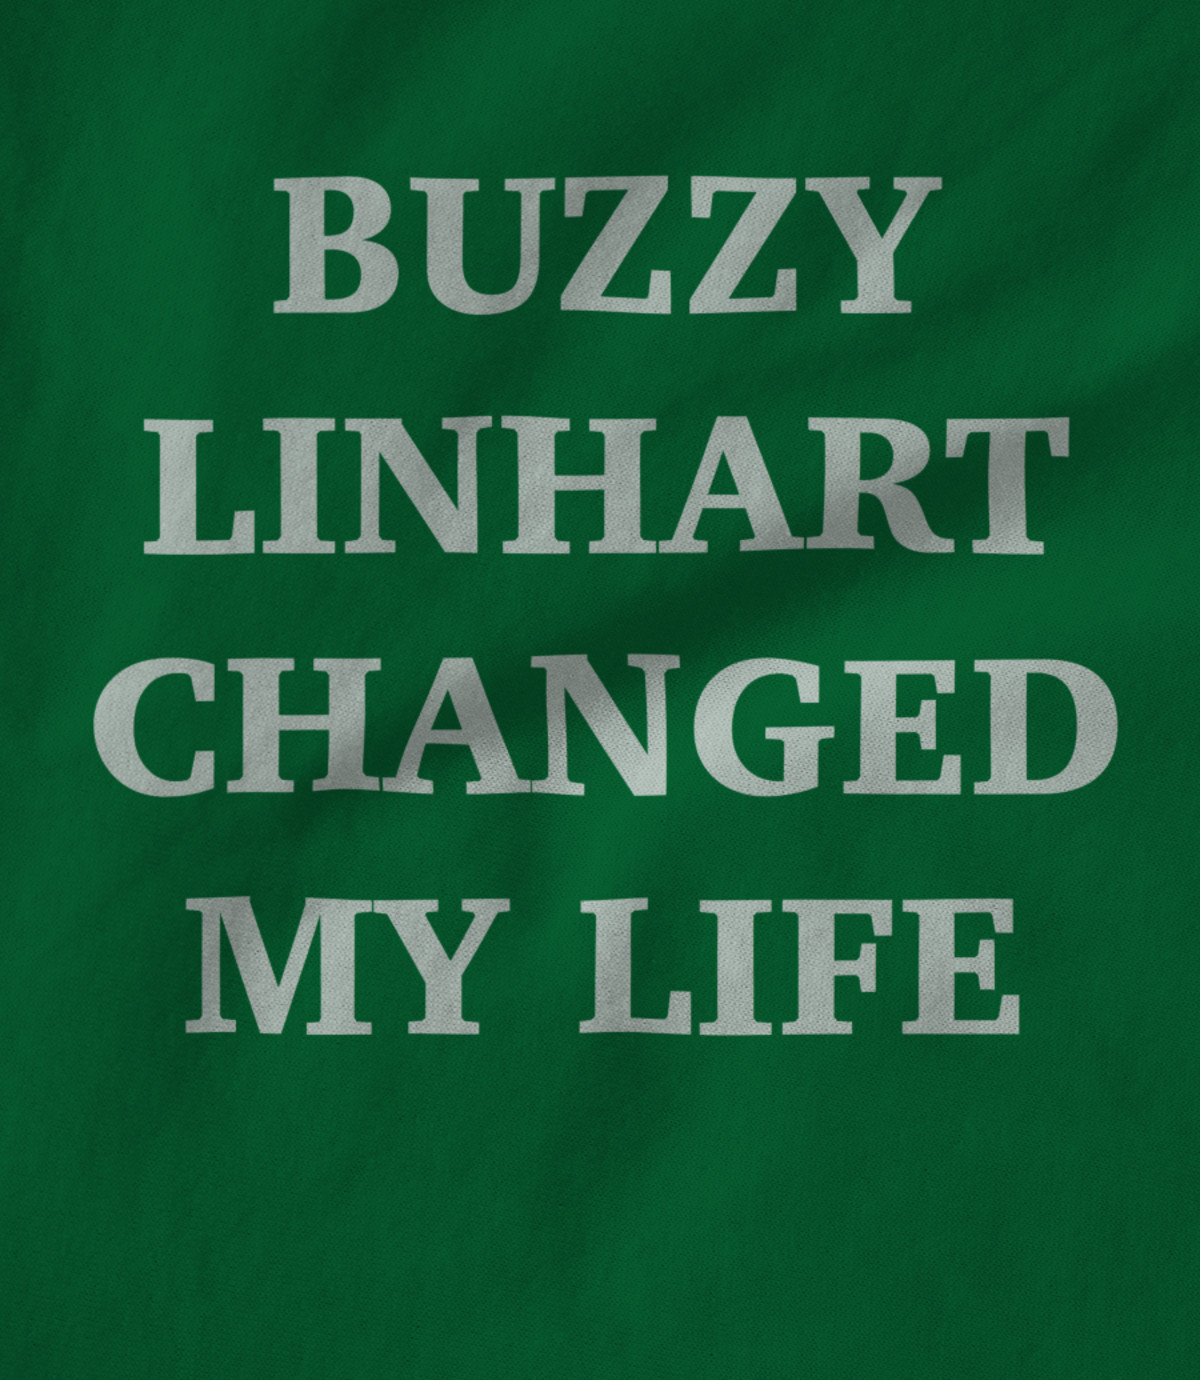 Buzzy linhart buzzy linhart changed my life 1513876054